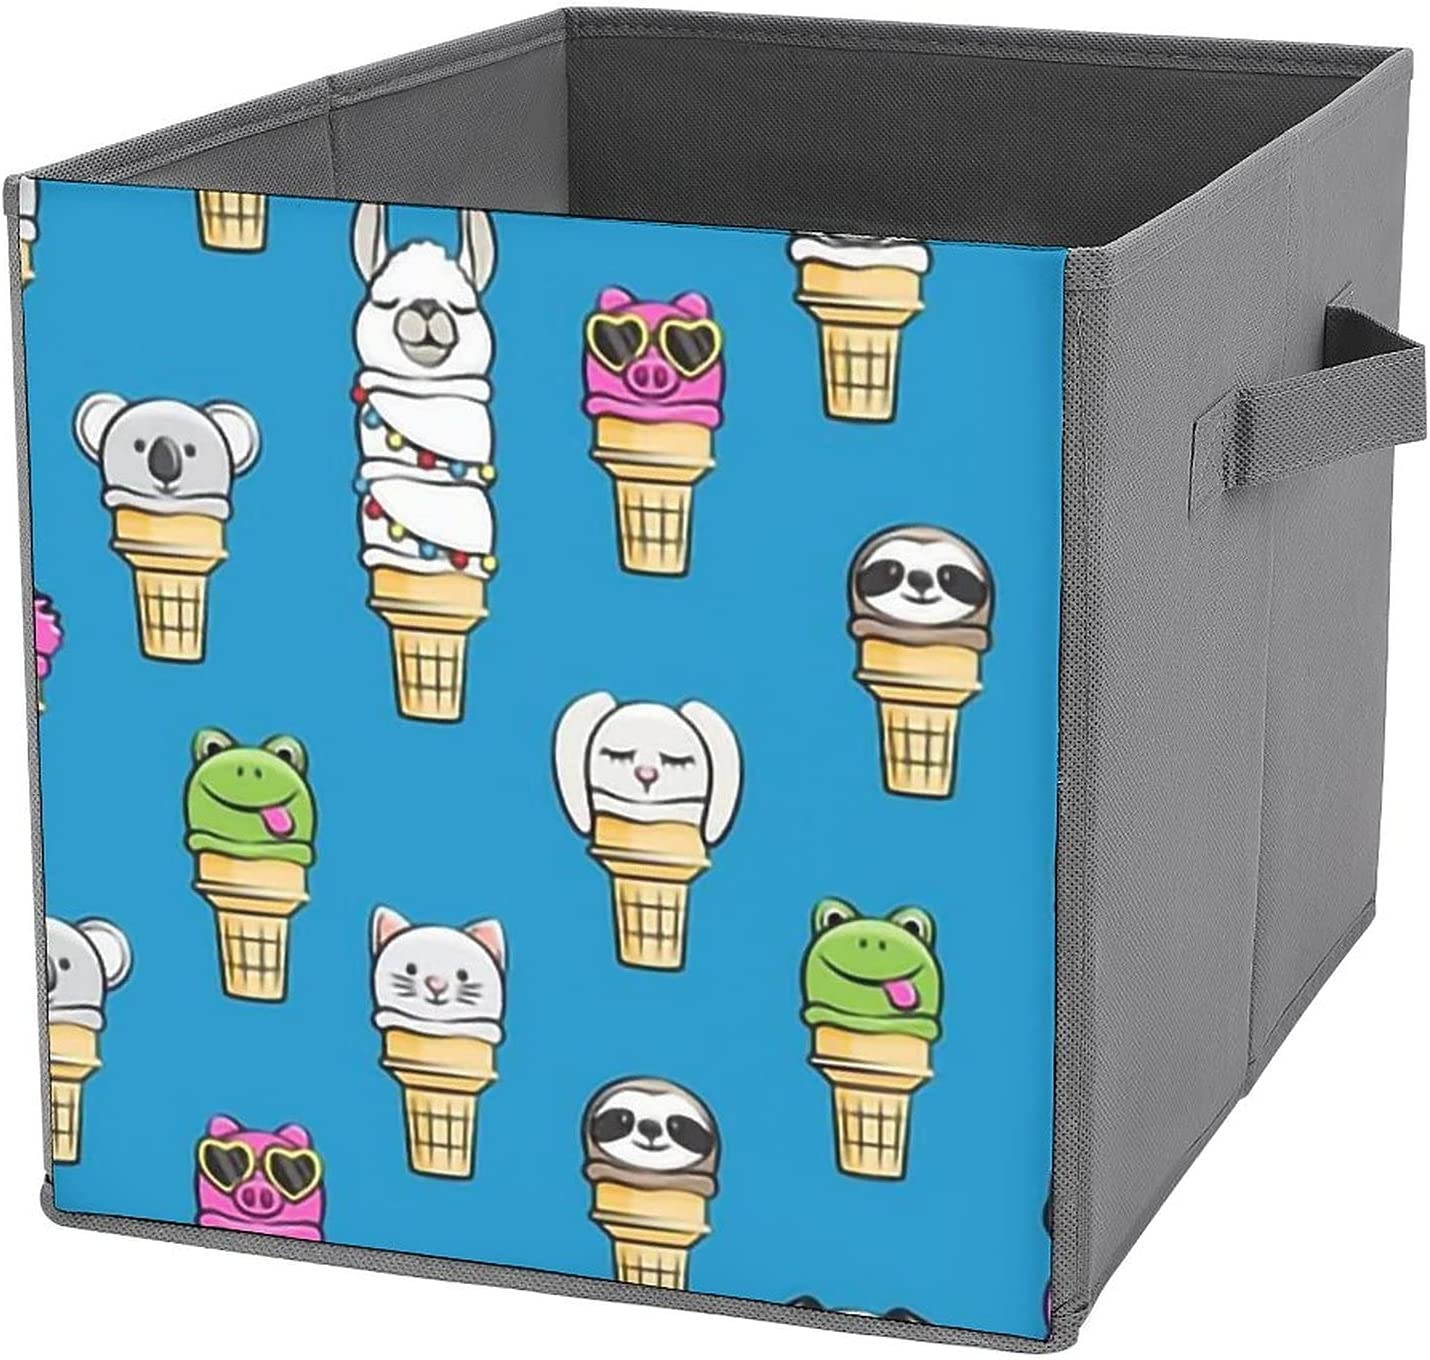 MMJUI Animal ice Challenge the lowest price Cream Cones Summer Fun Folding Blue Finally popular brand Bin Storage